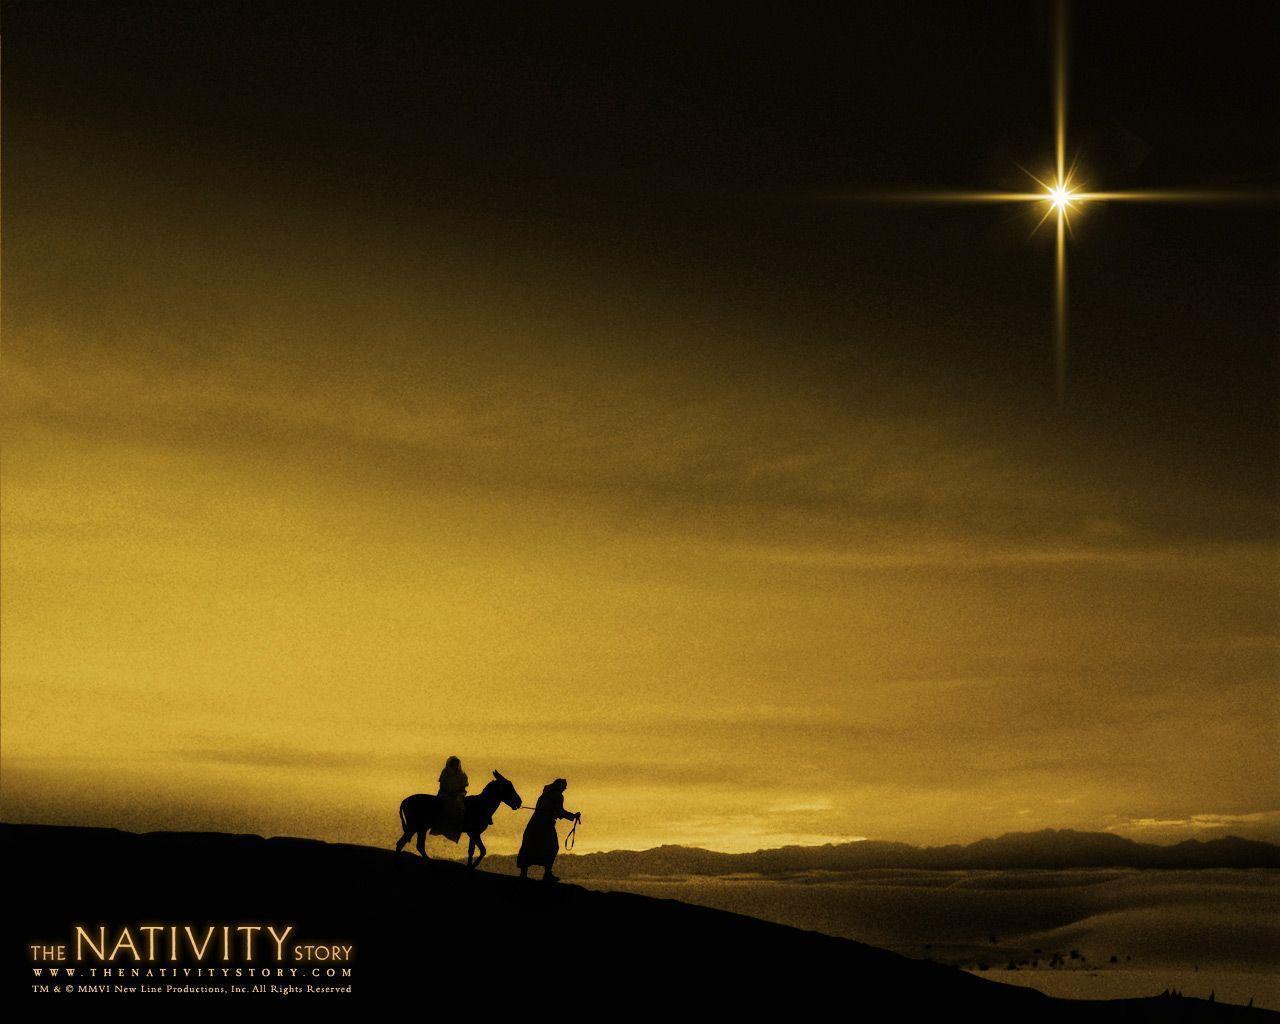 Christian Christmas Backgrounds 1280x1024